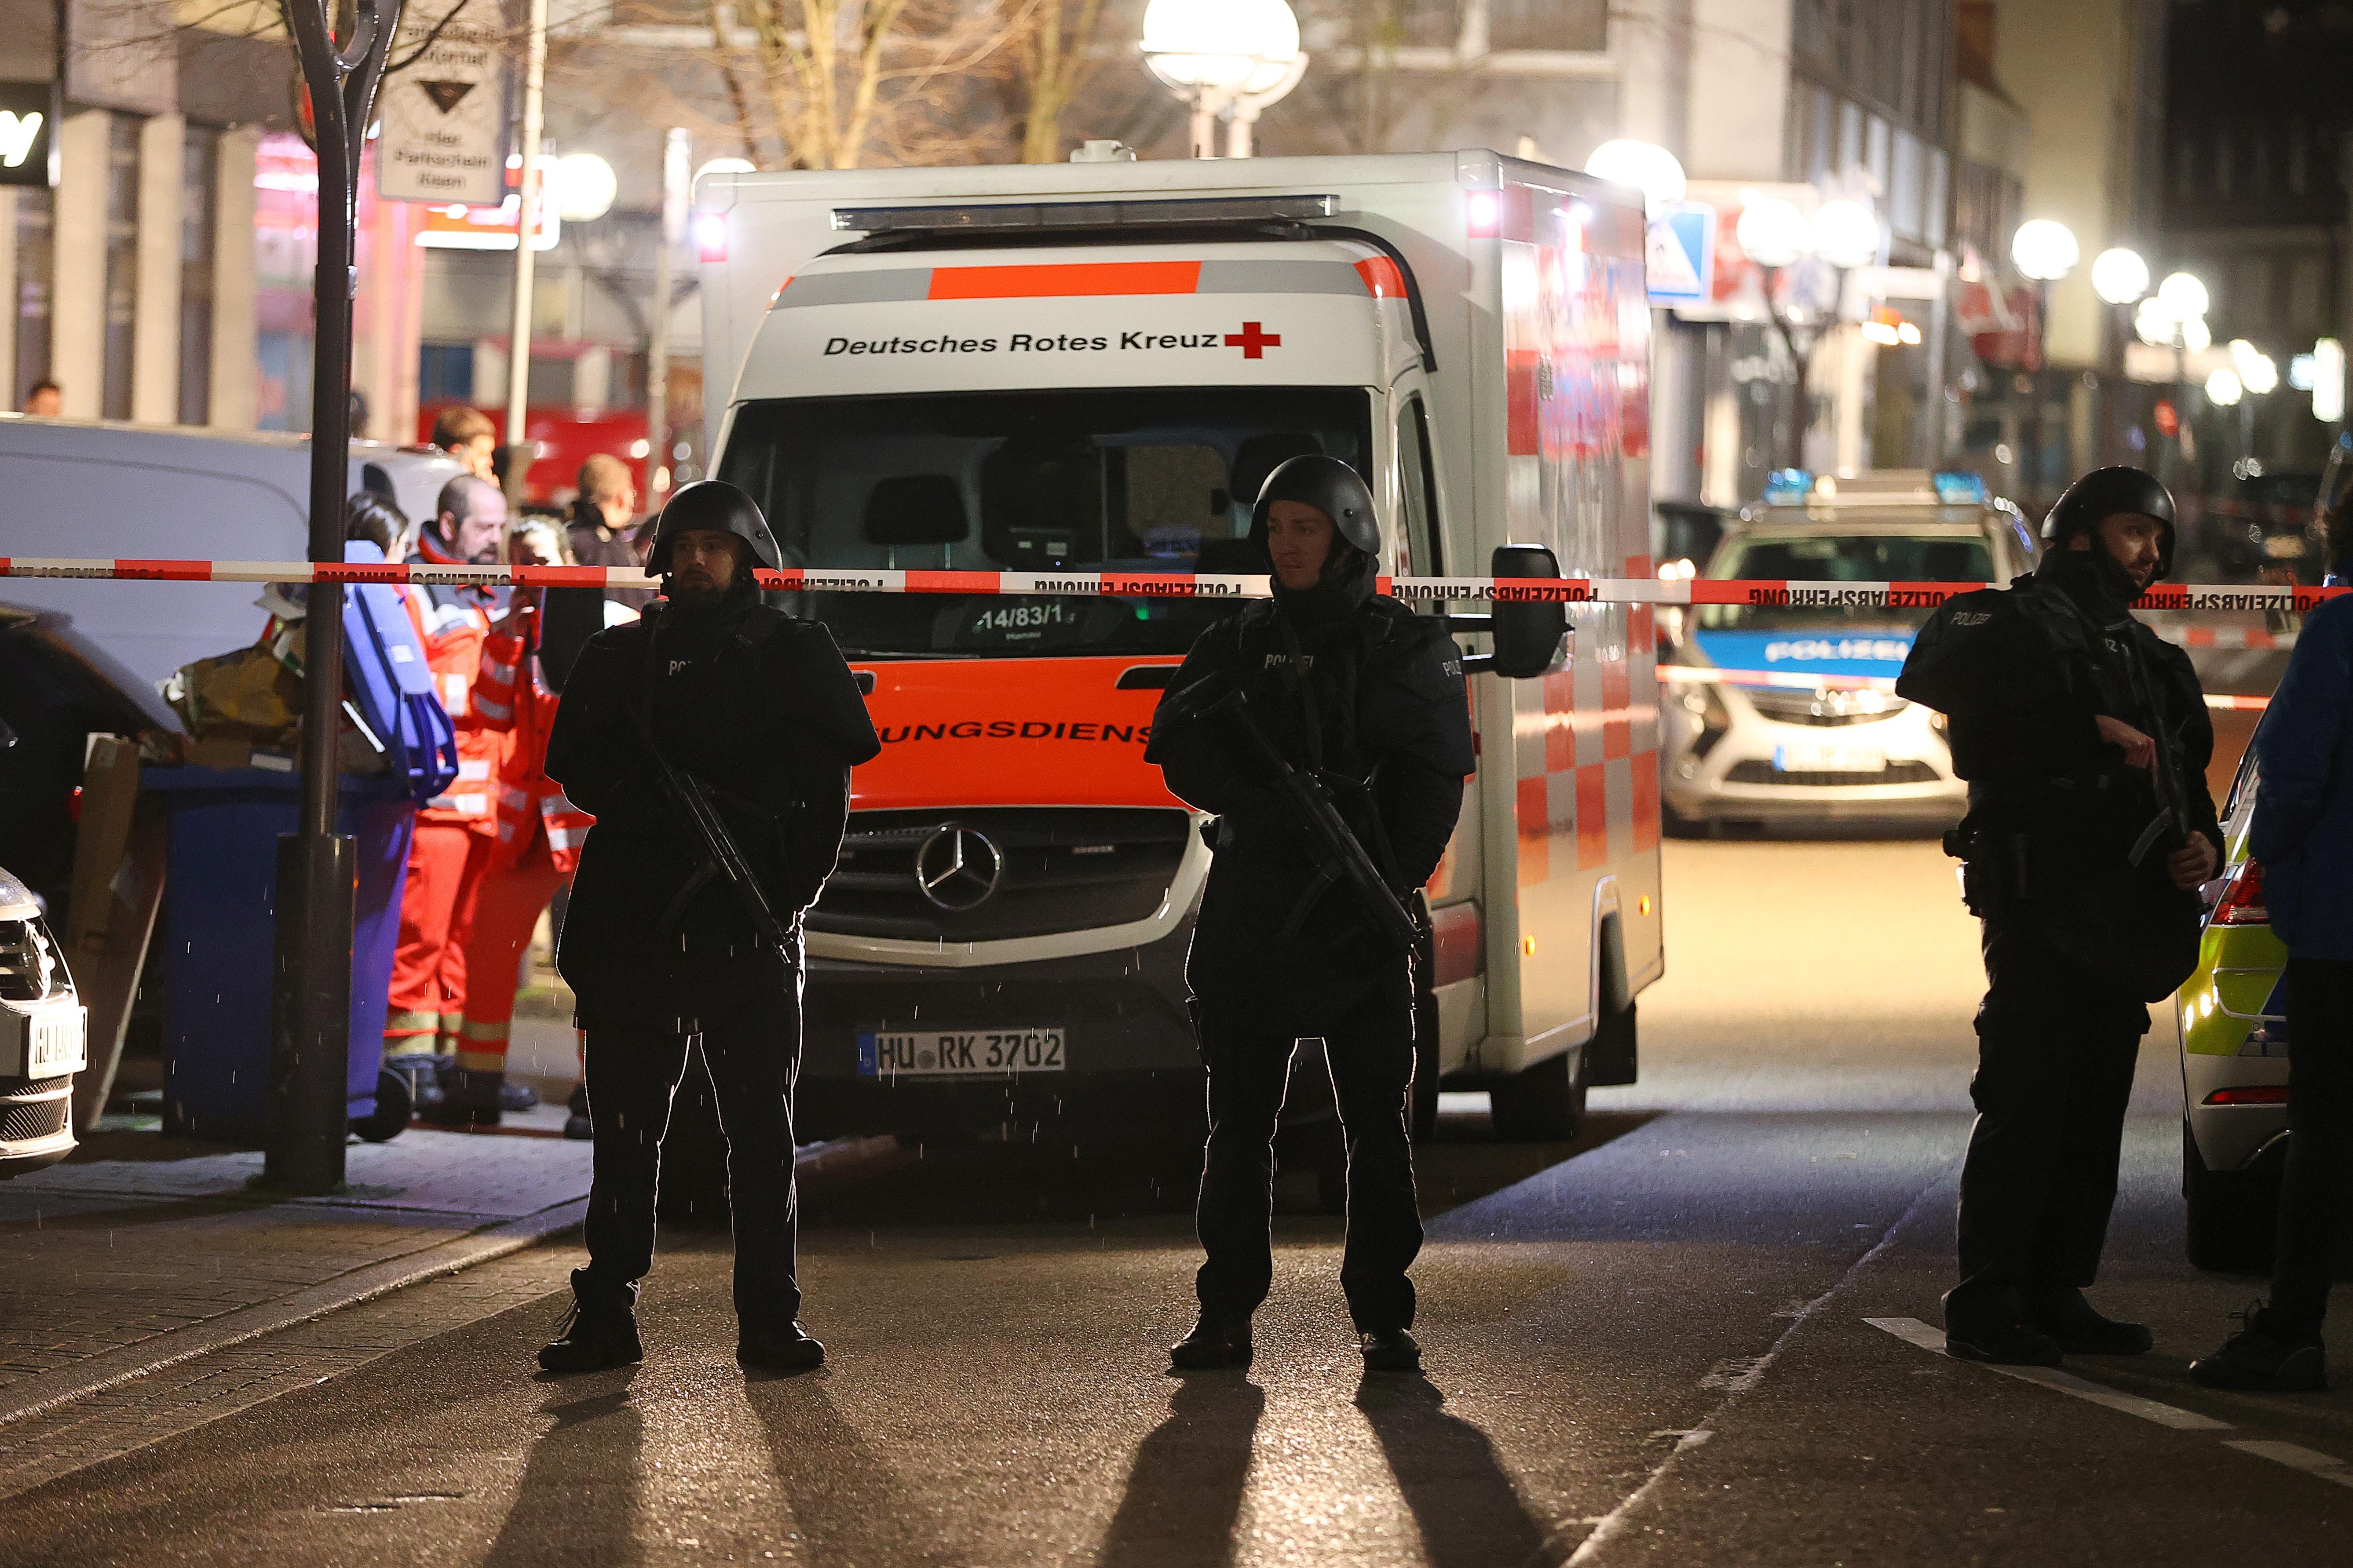 German gunman kills nine in attack on migrant bars